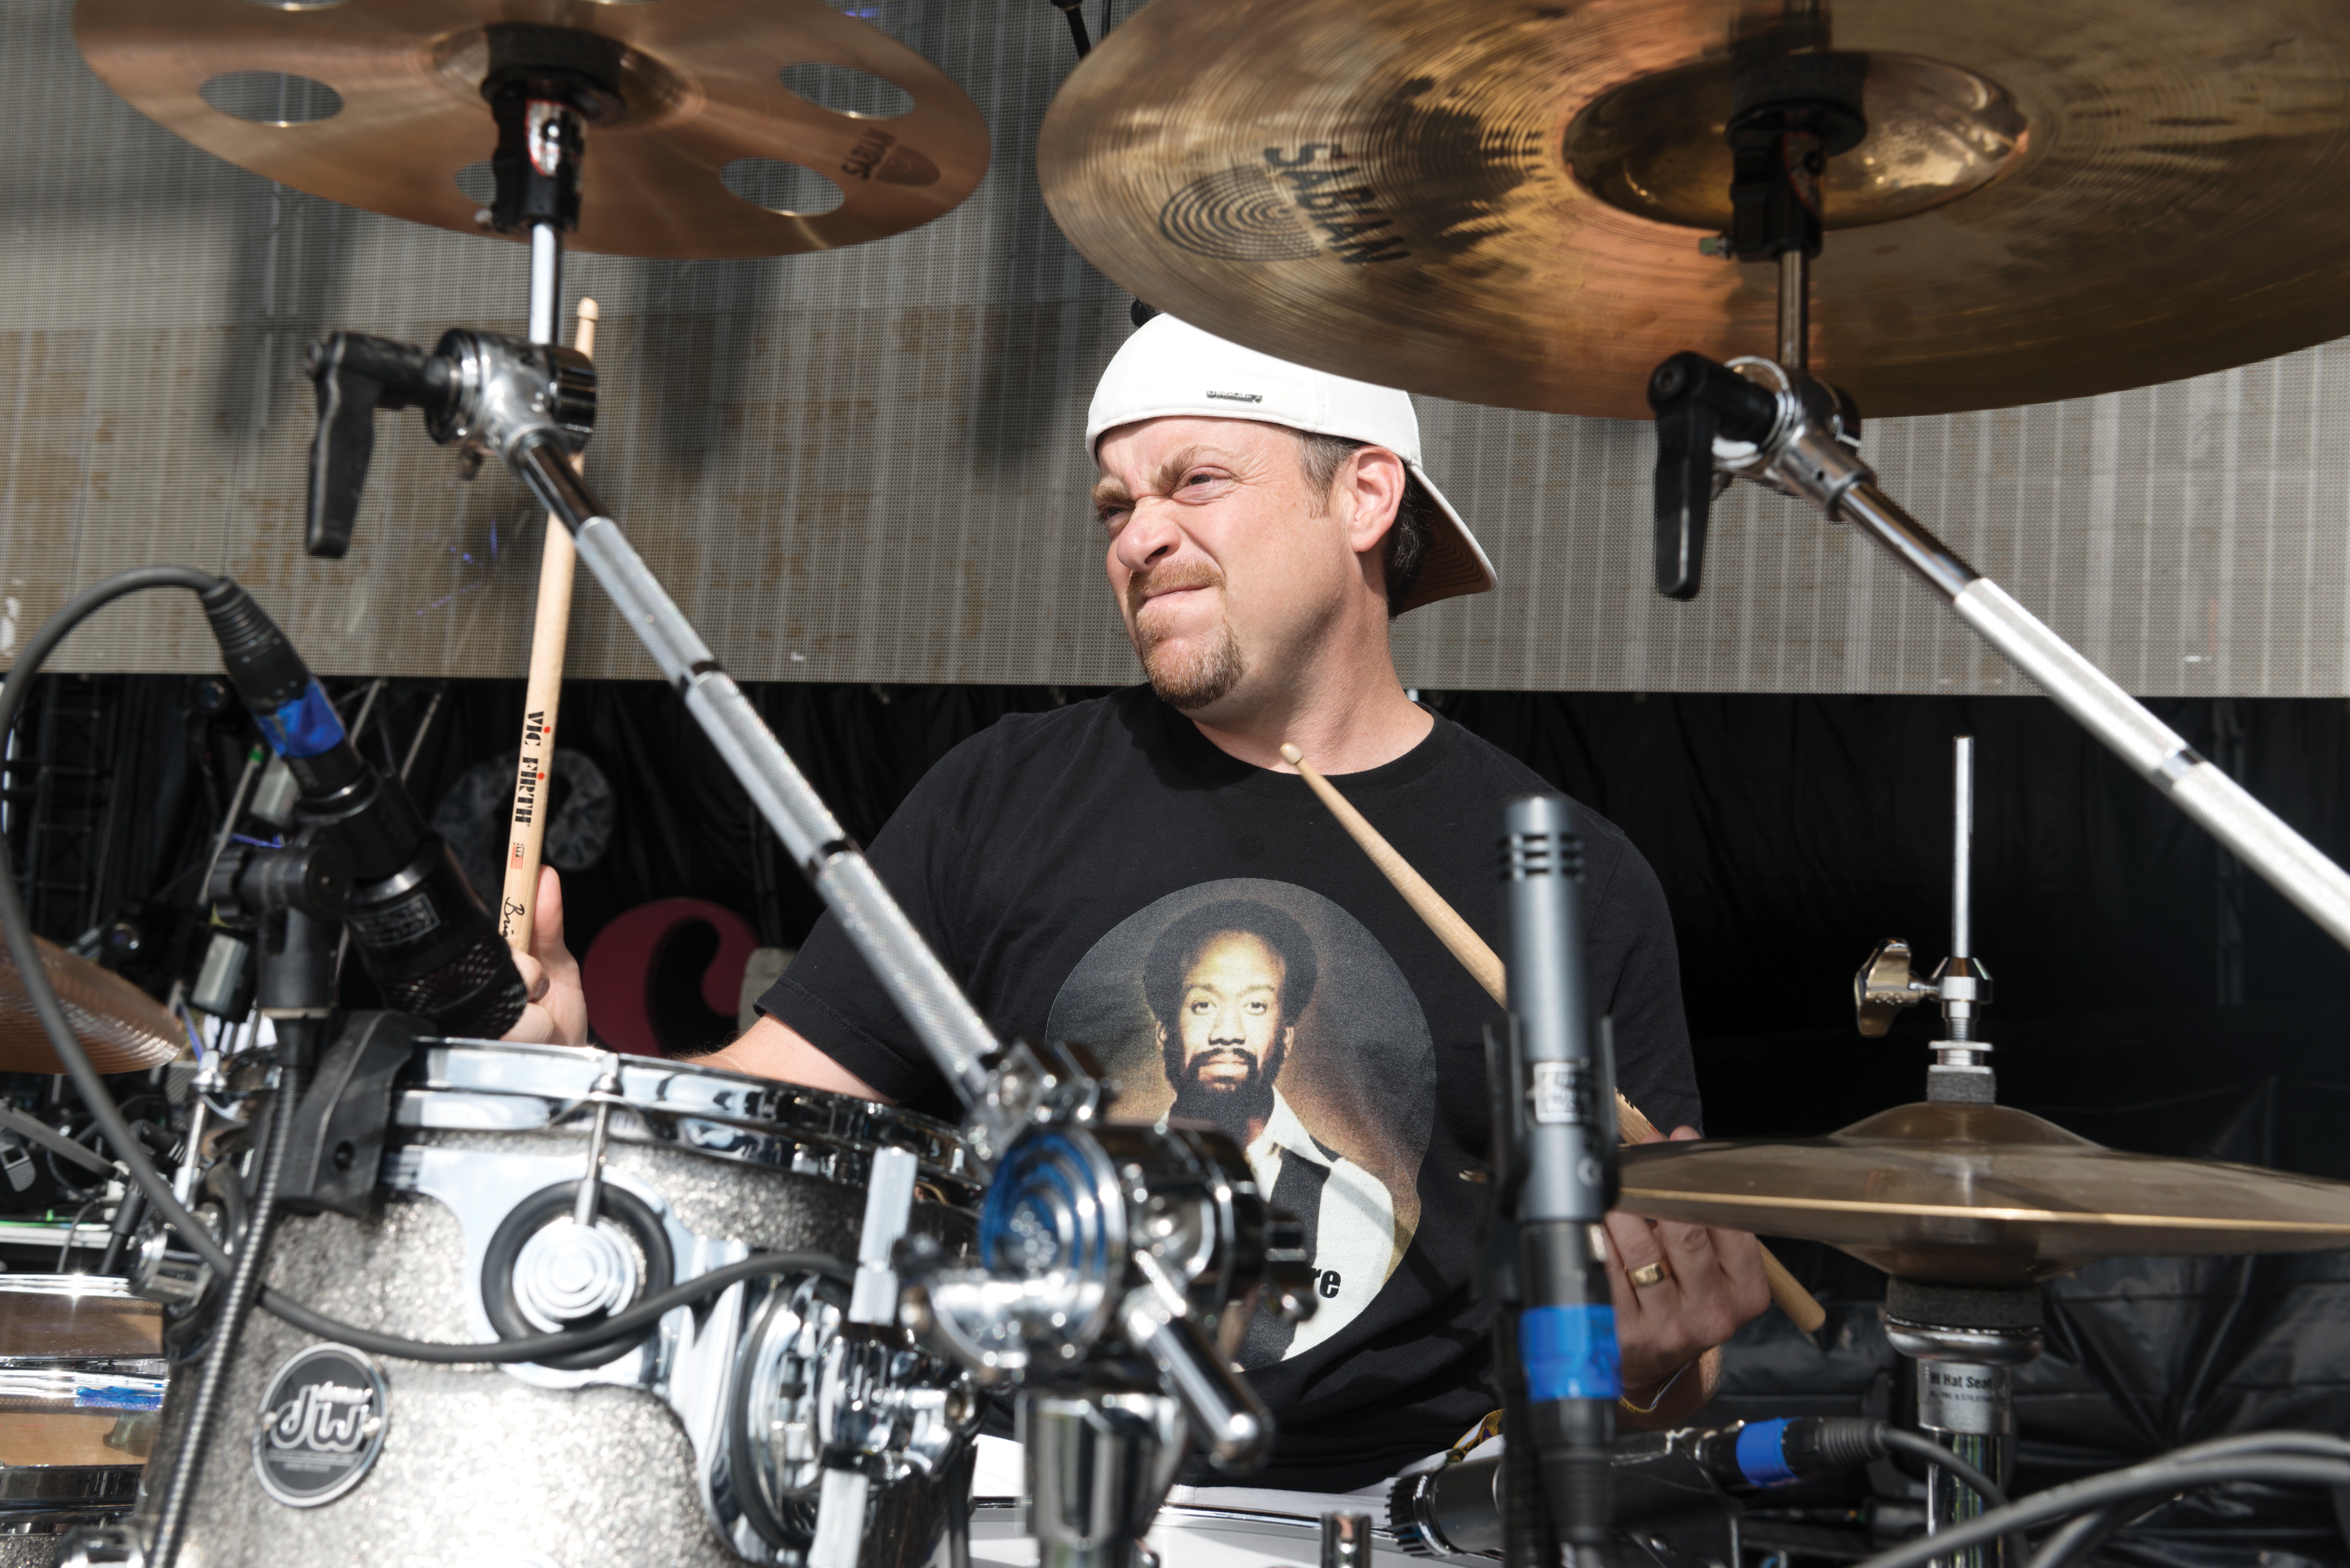 daryl hall and john oates' brian dunne - modern drummer magazine